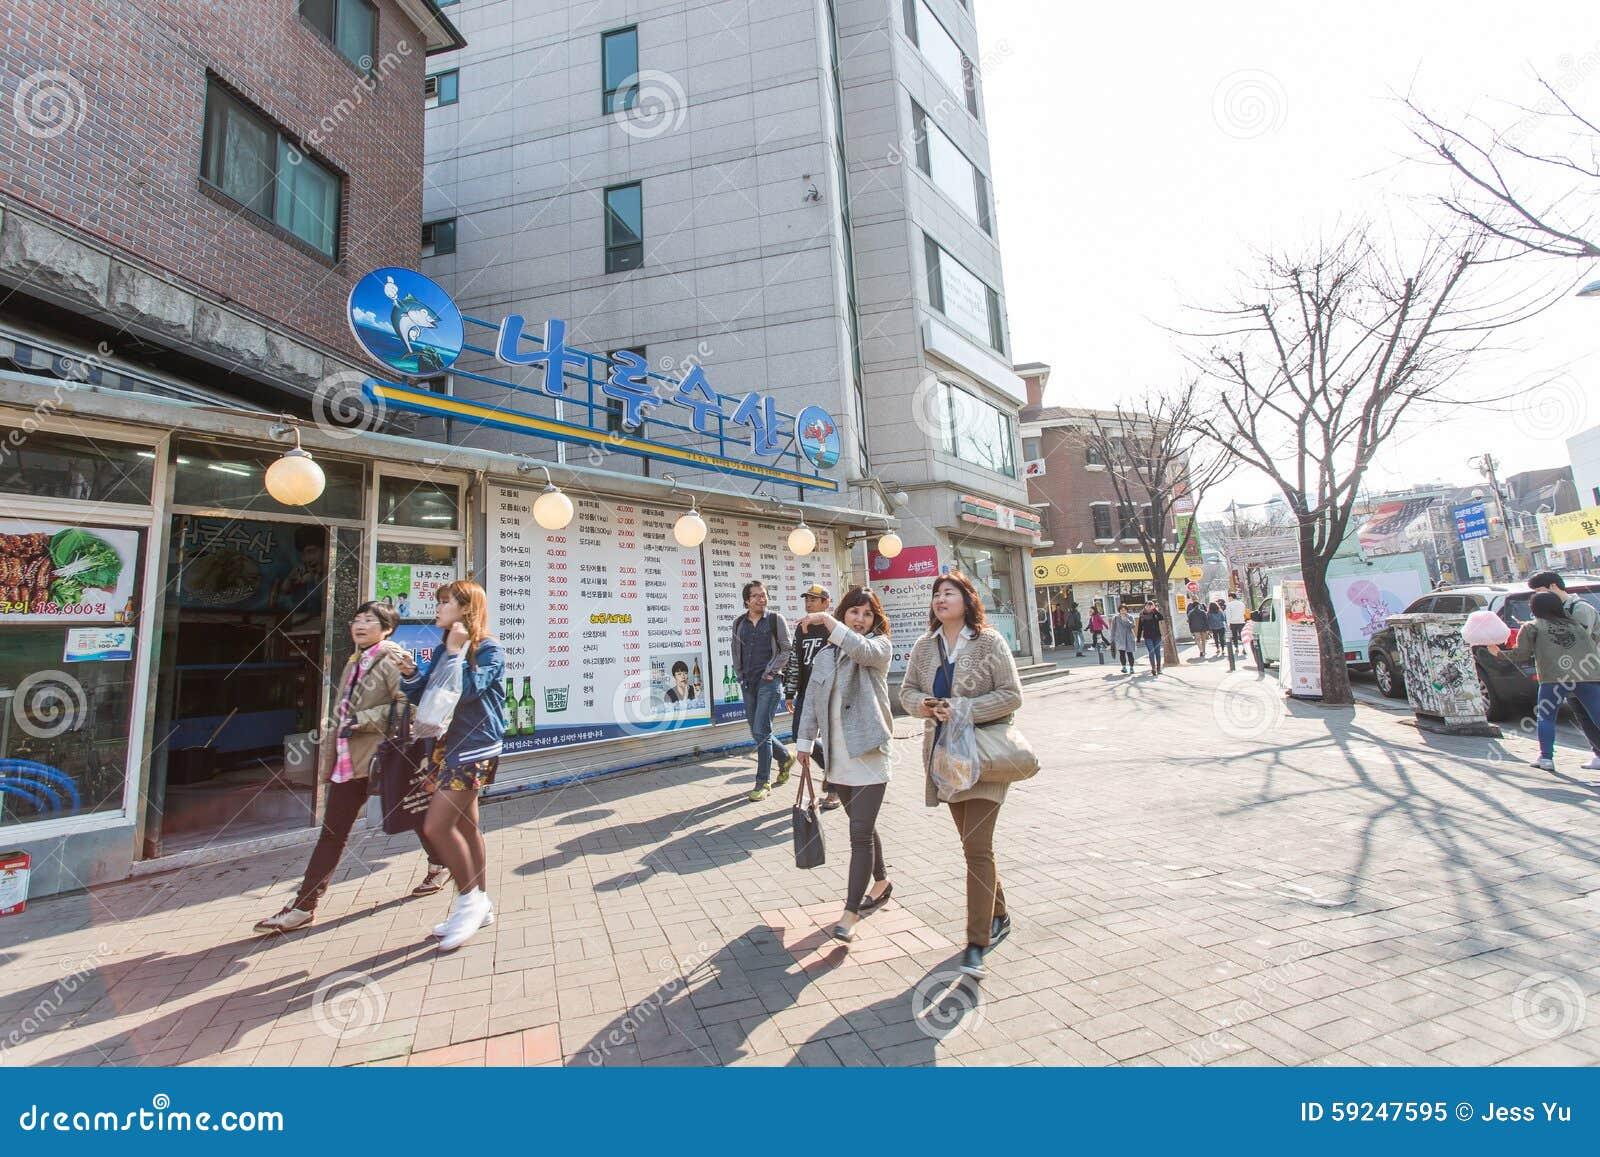 South Korea Green Street Food Place